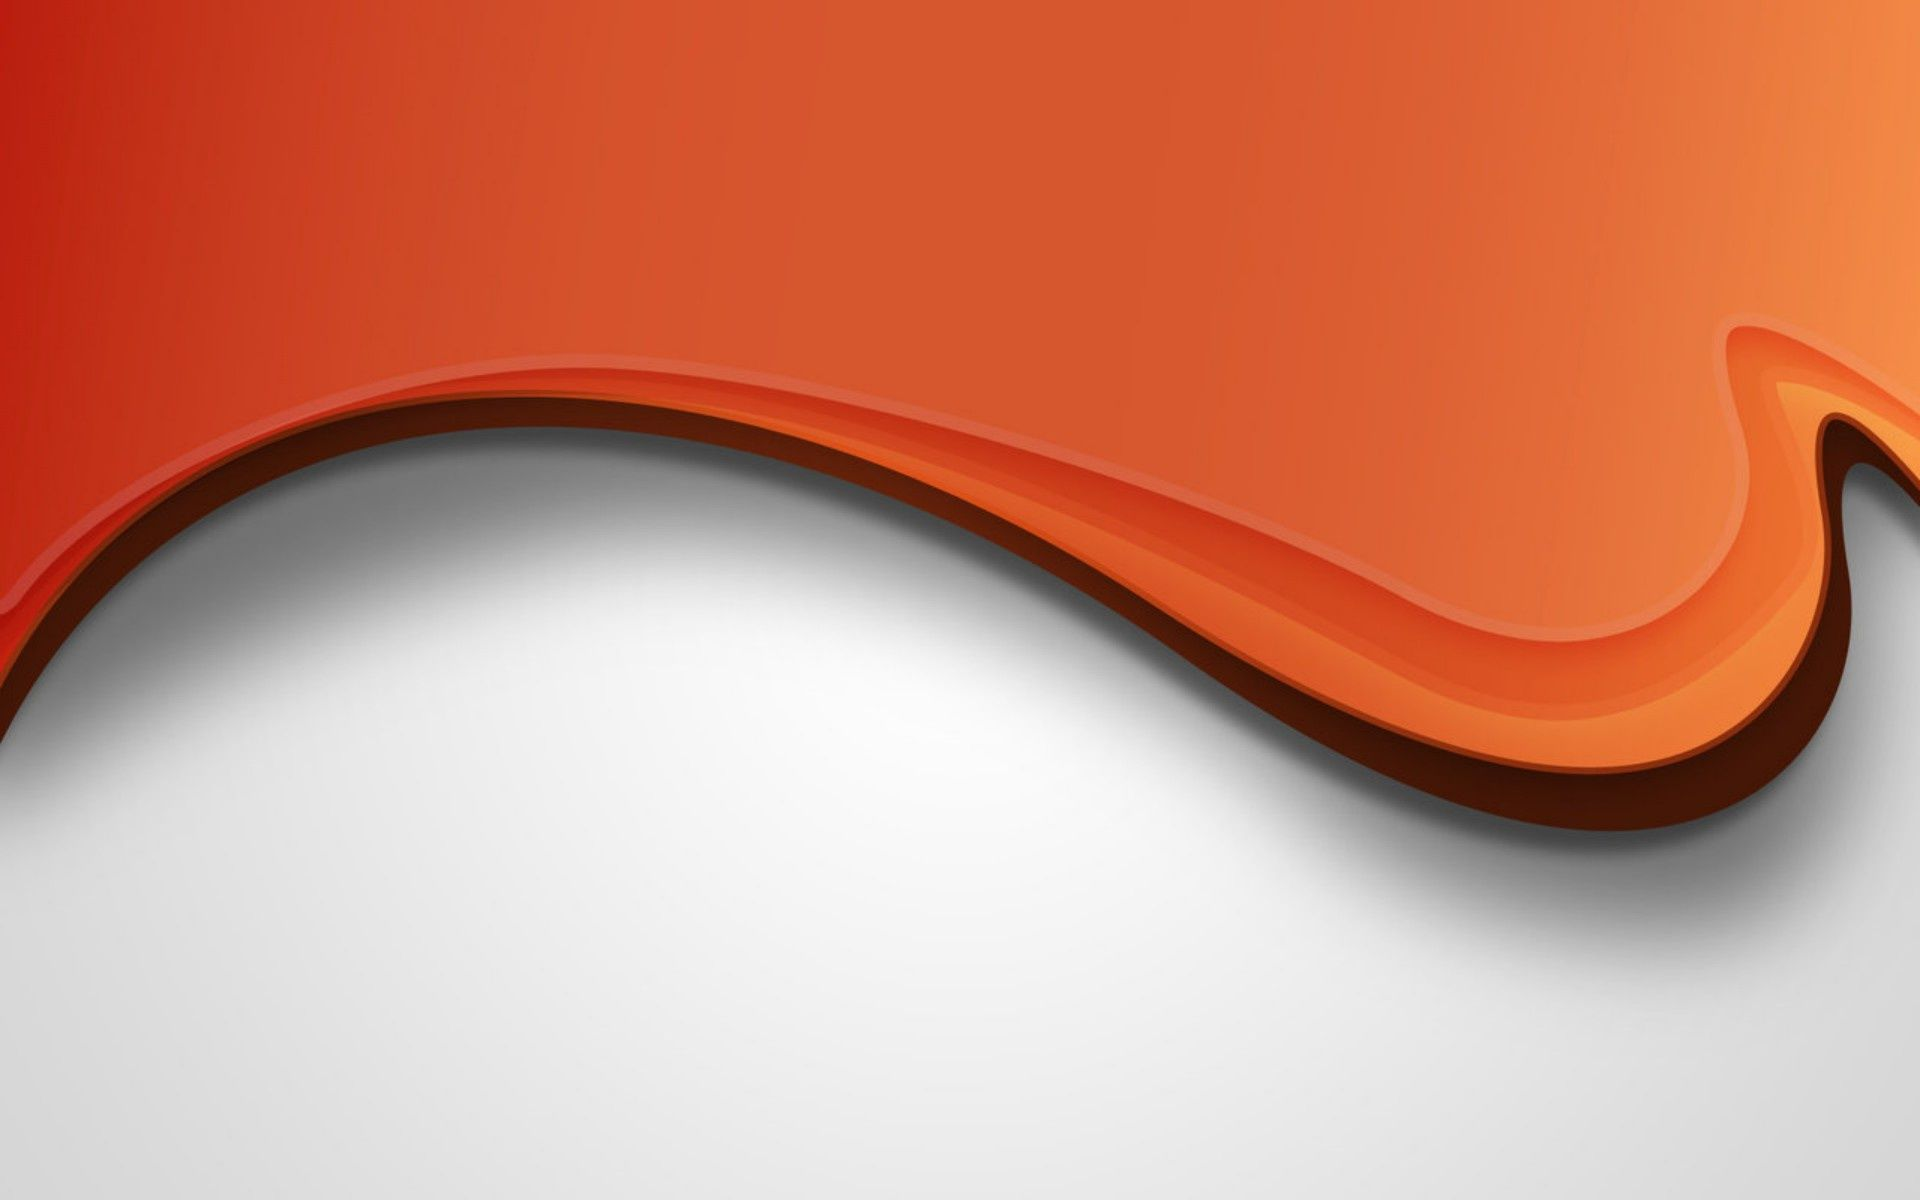 orange wave wallpaper - photo #18